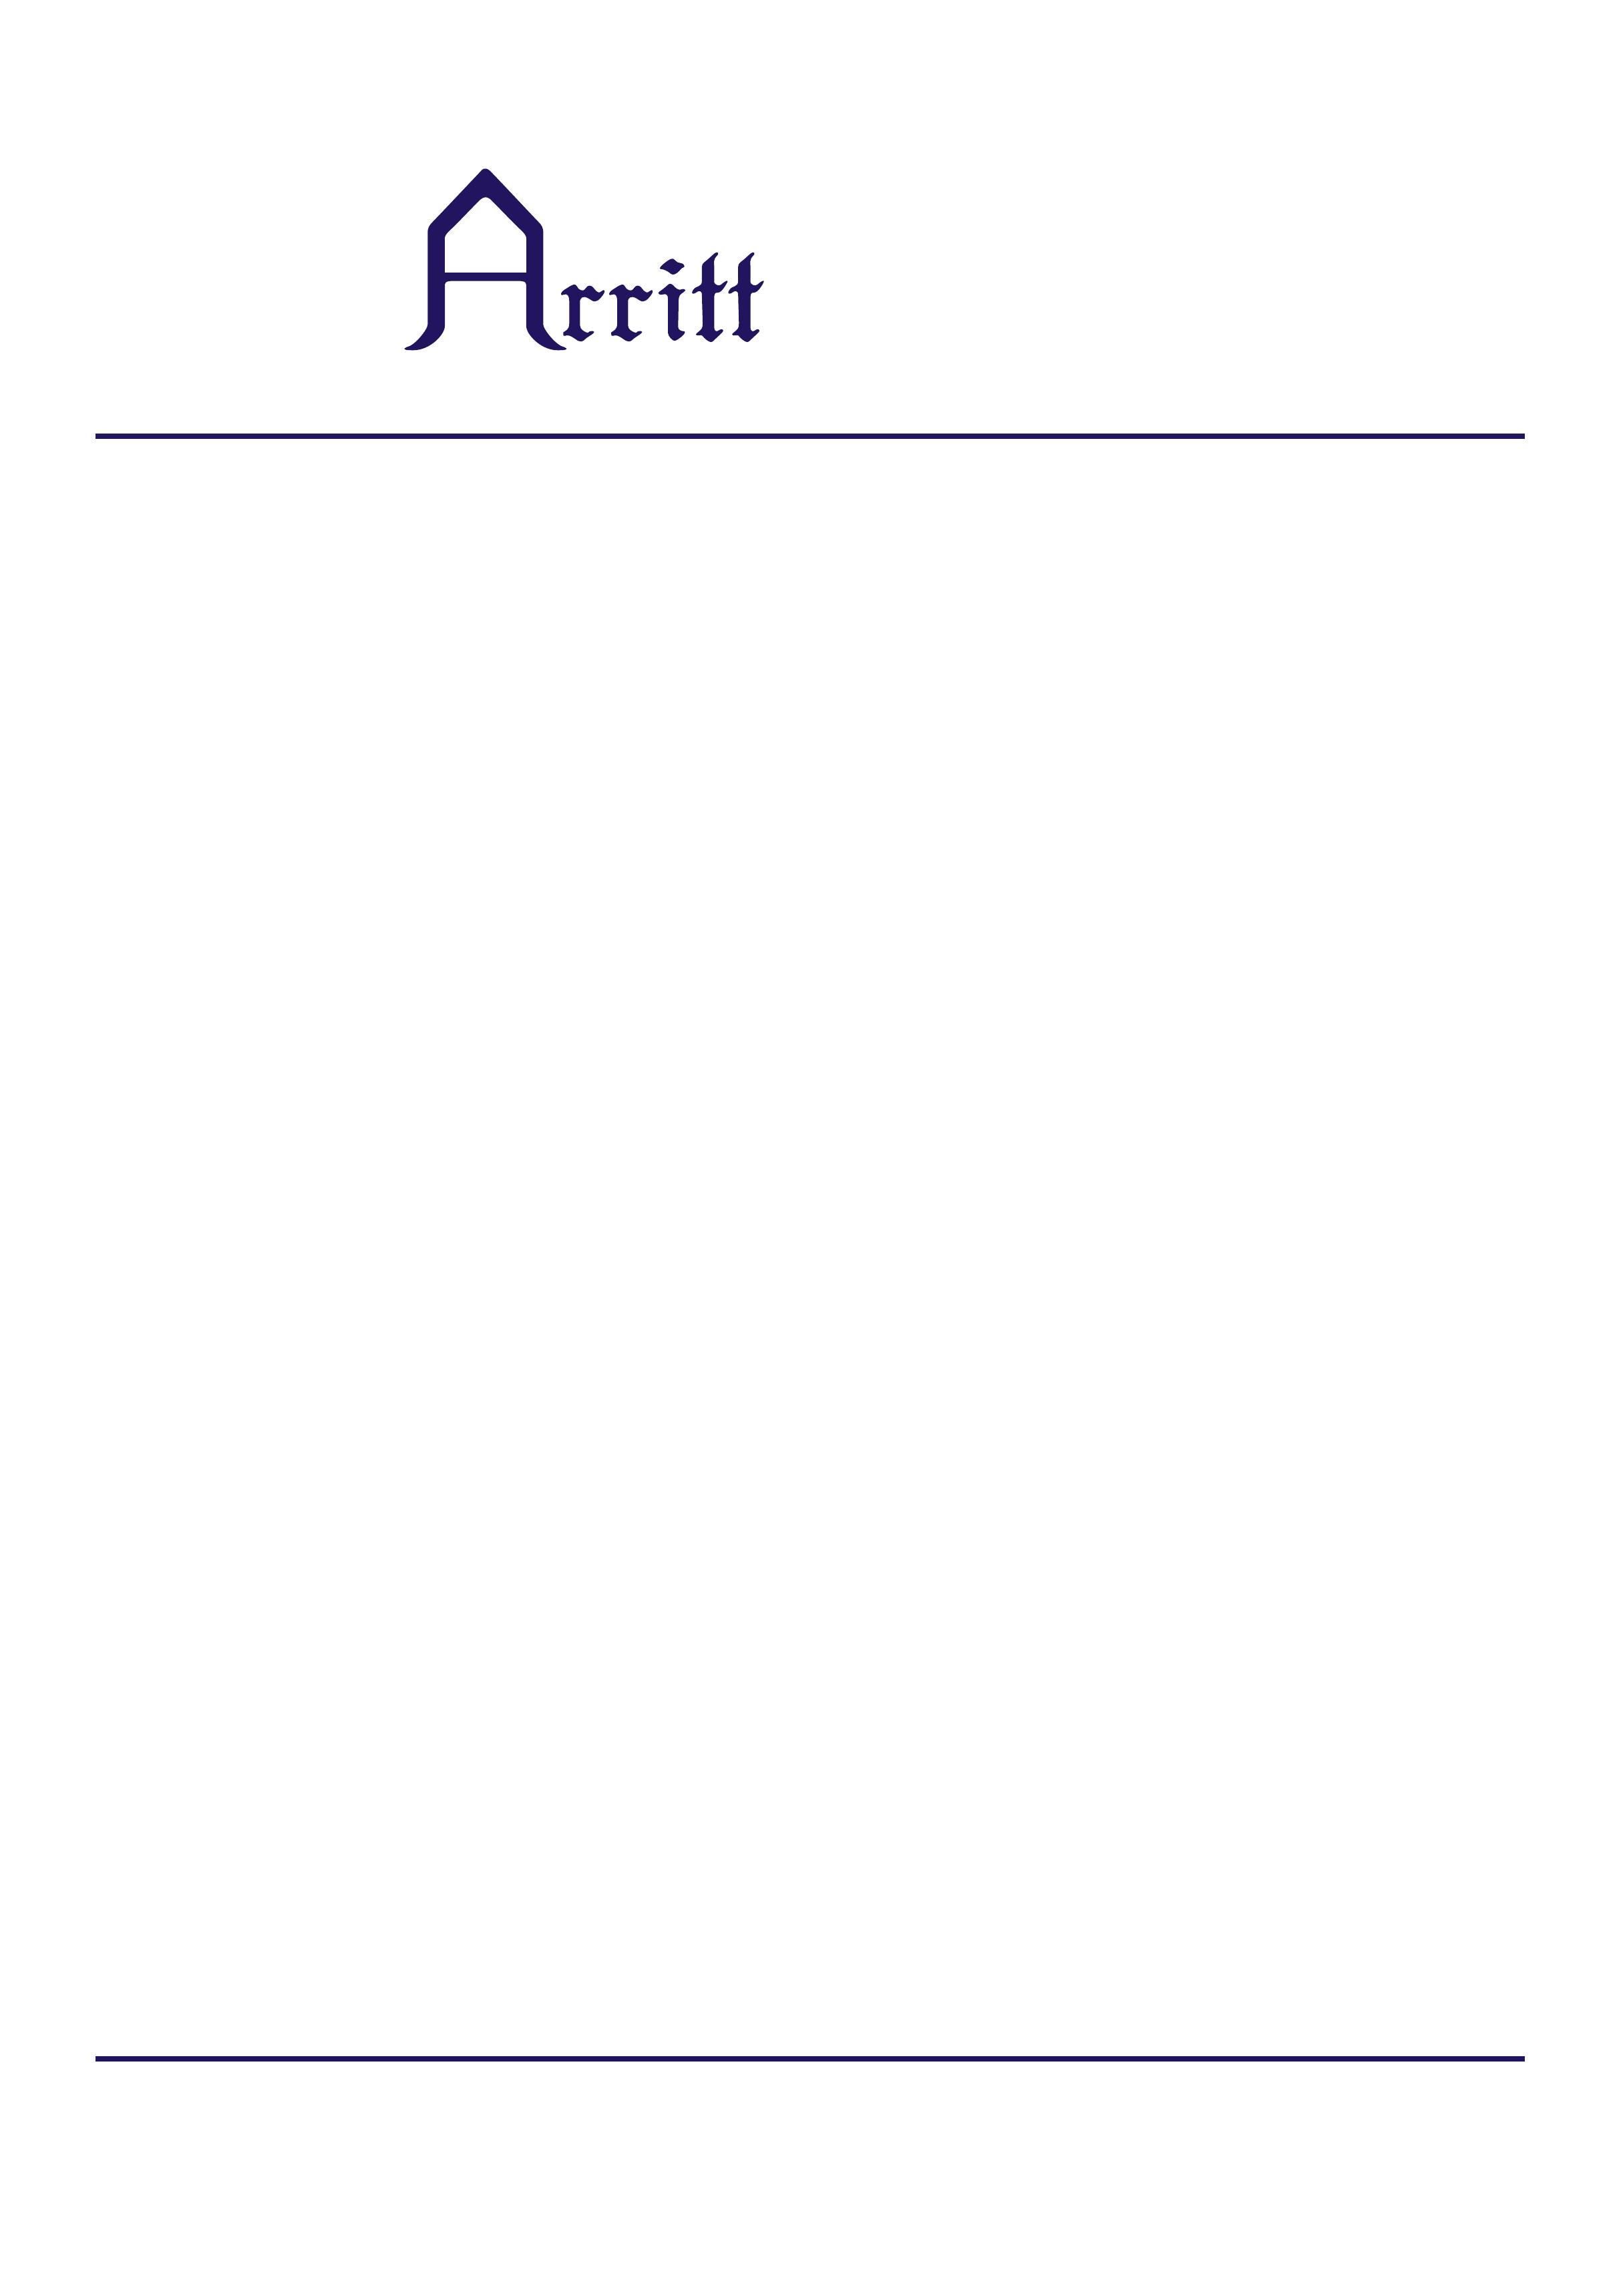 funeral checklist form free download event planning pinterest